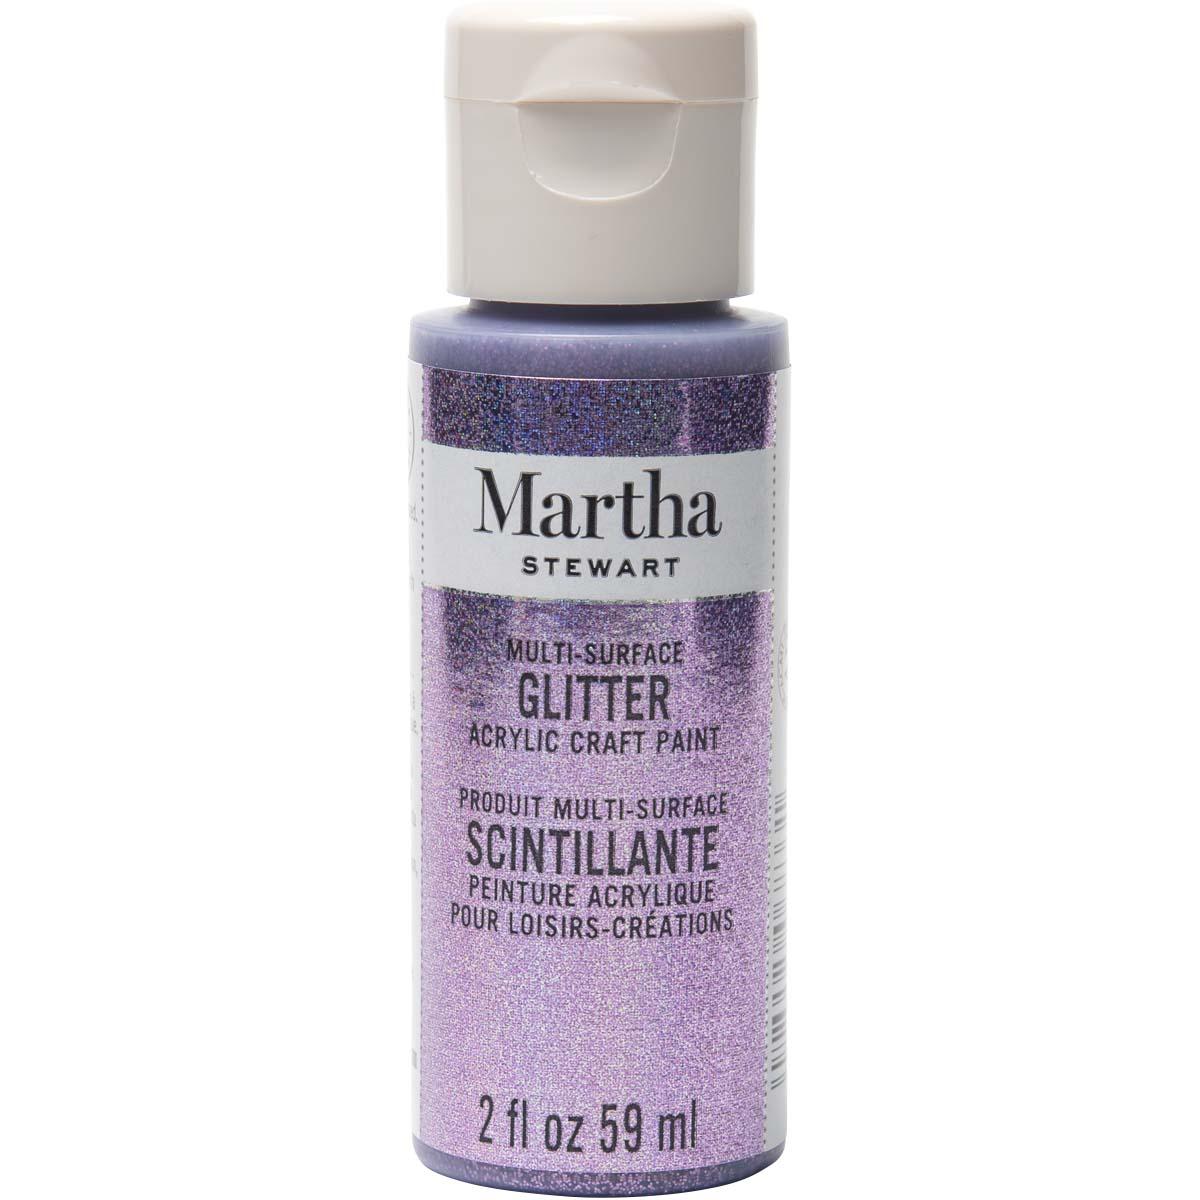 Martha Stewart ® Multi-Surface Glitter Acrylic Craft Paint - Charoite, 2 oz. - 32161CA